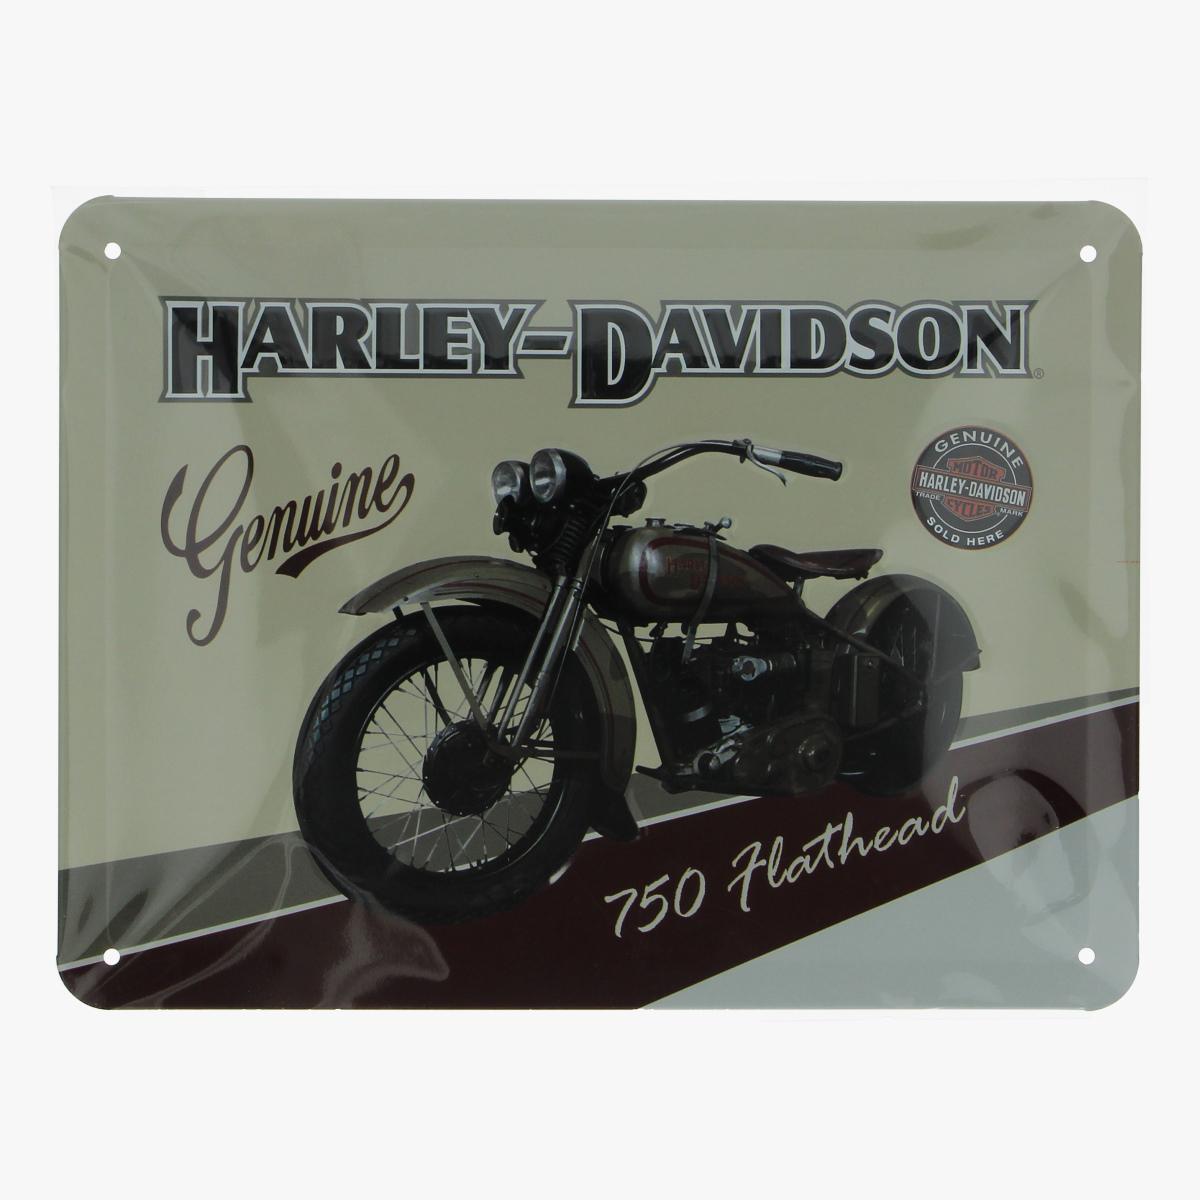 Afbeeldingen van blikken bordje Harley-Davidson 750 flathead repro